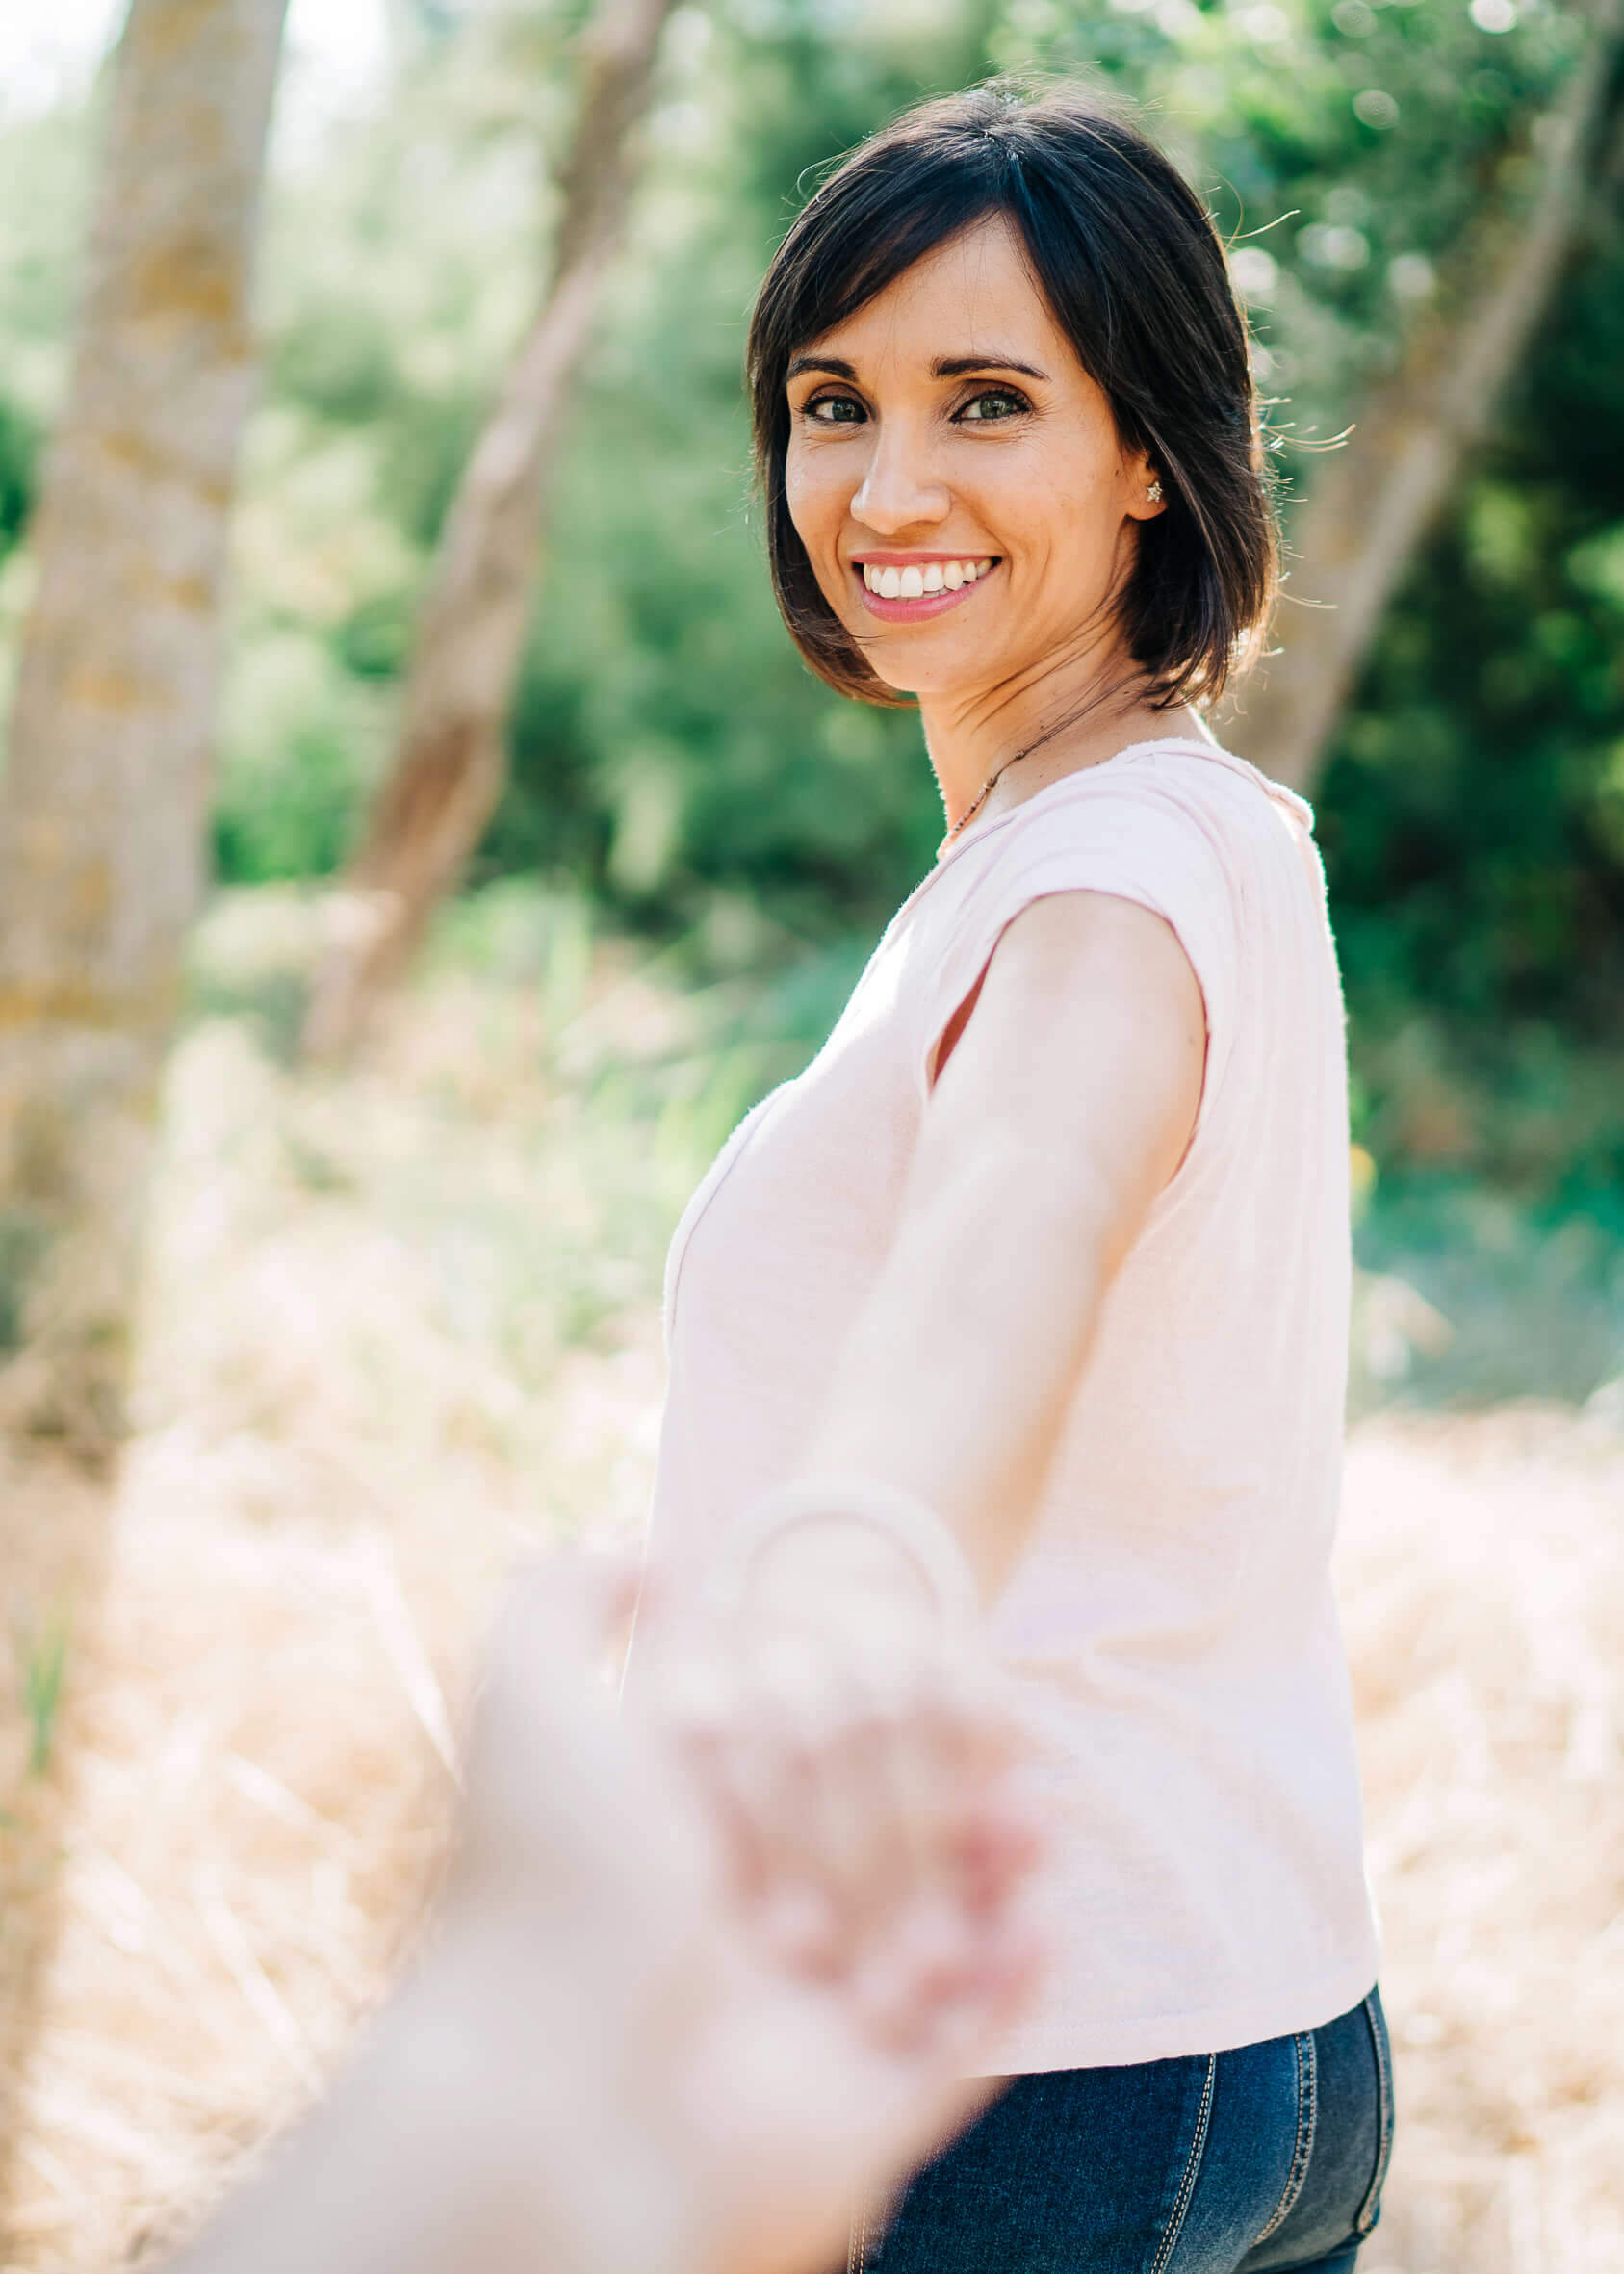 Shaila Romero - Acompáñame al bienestar